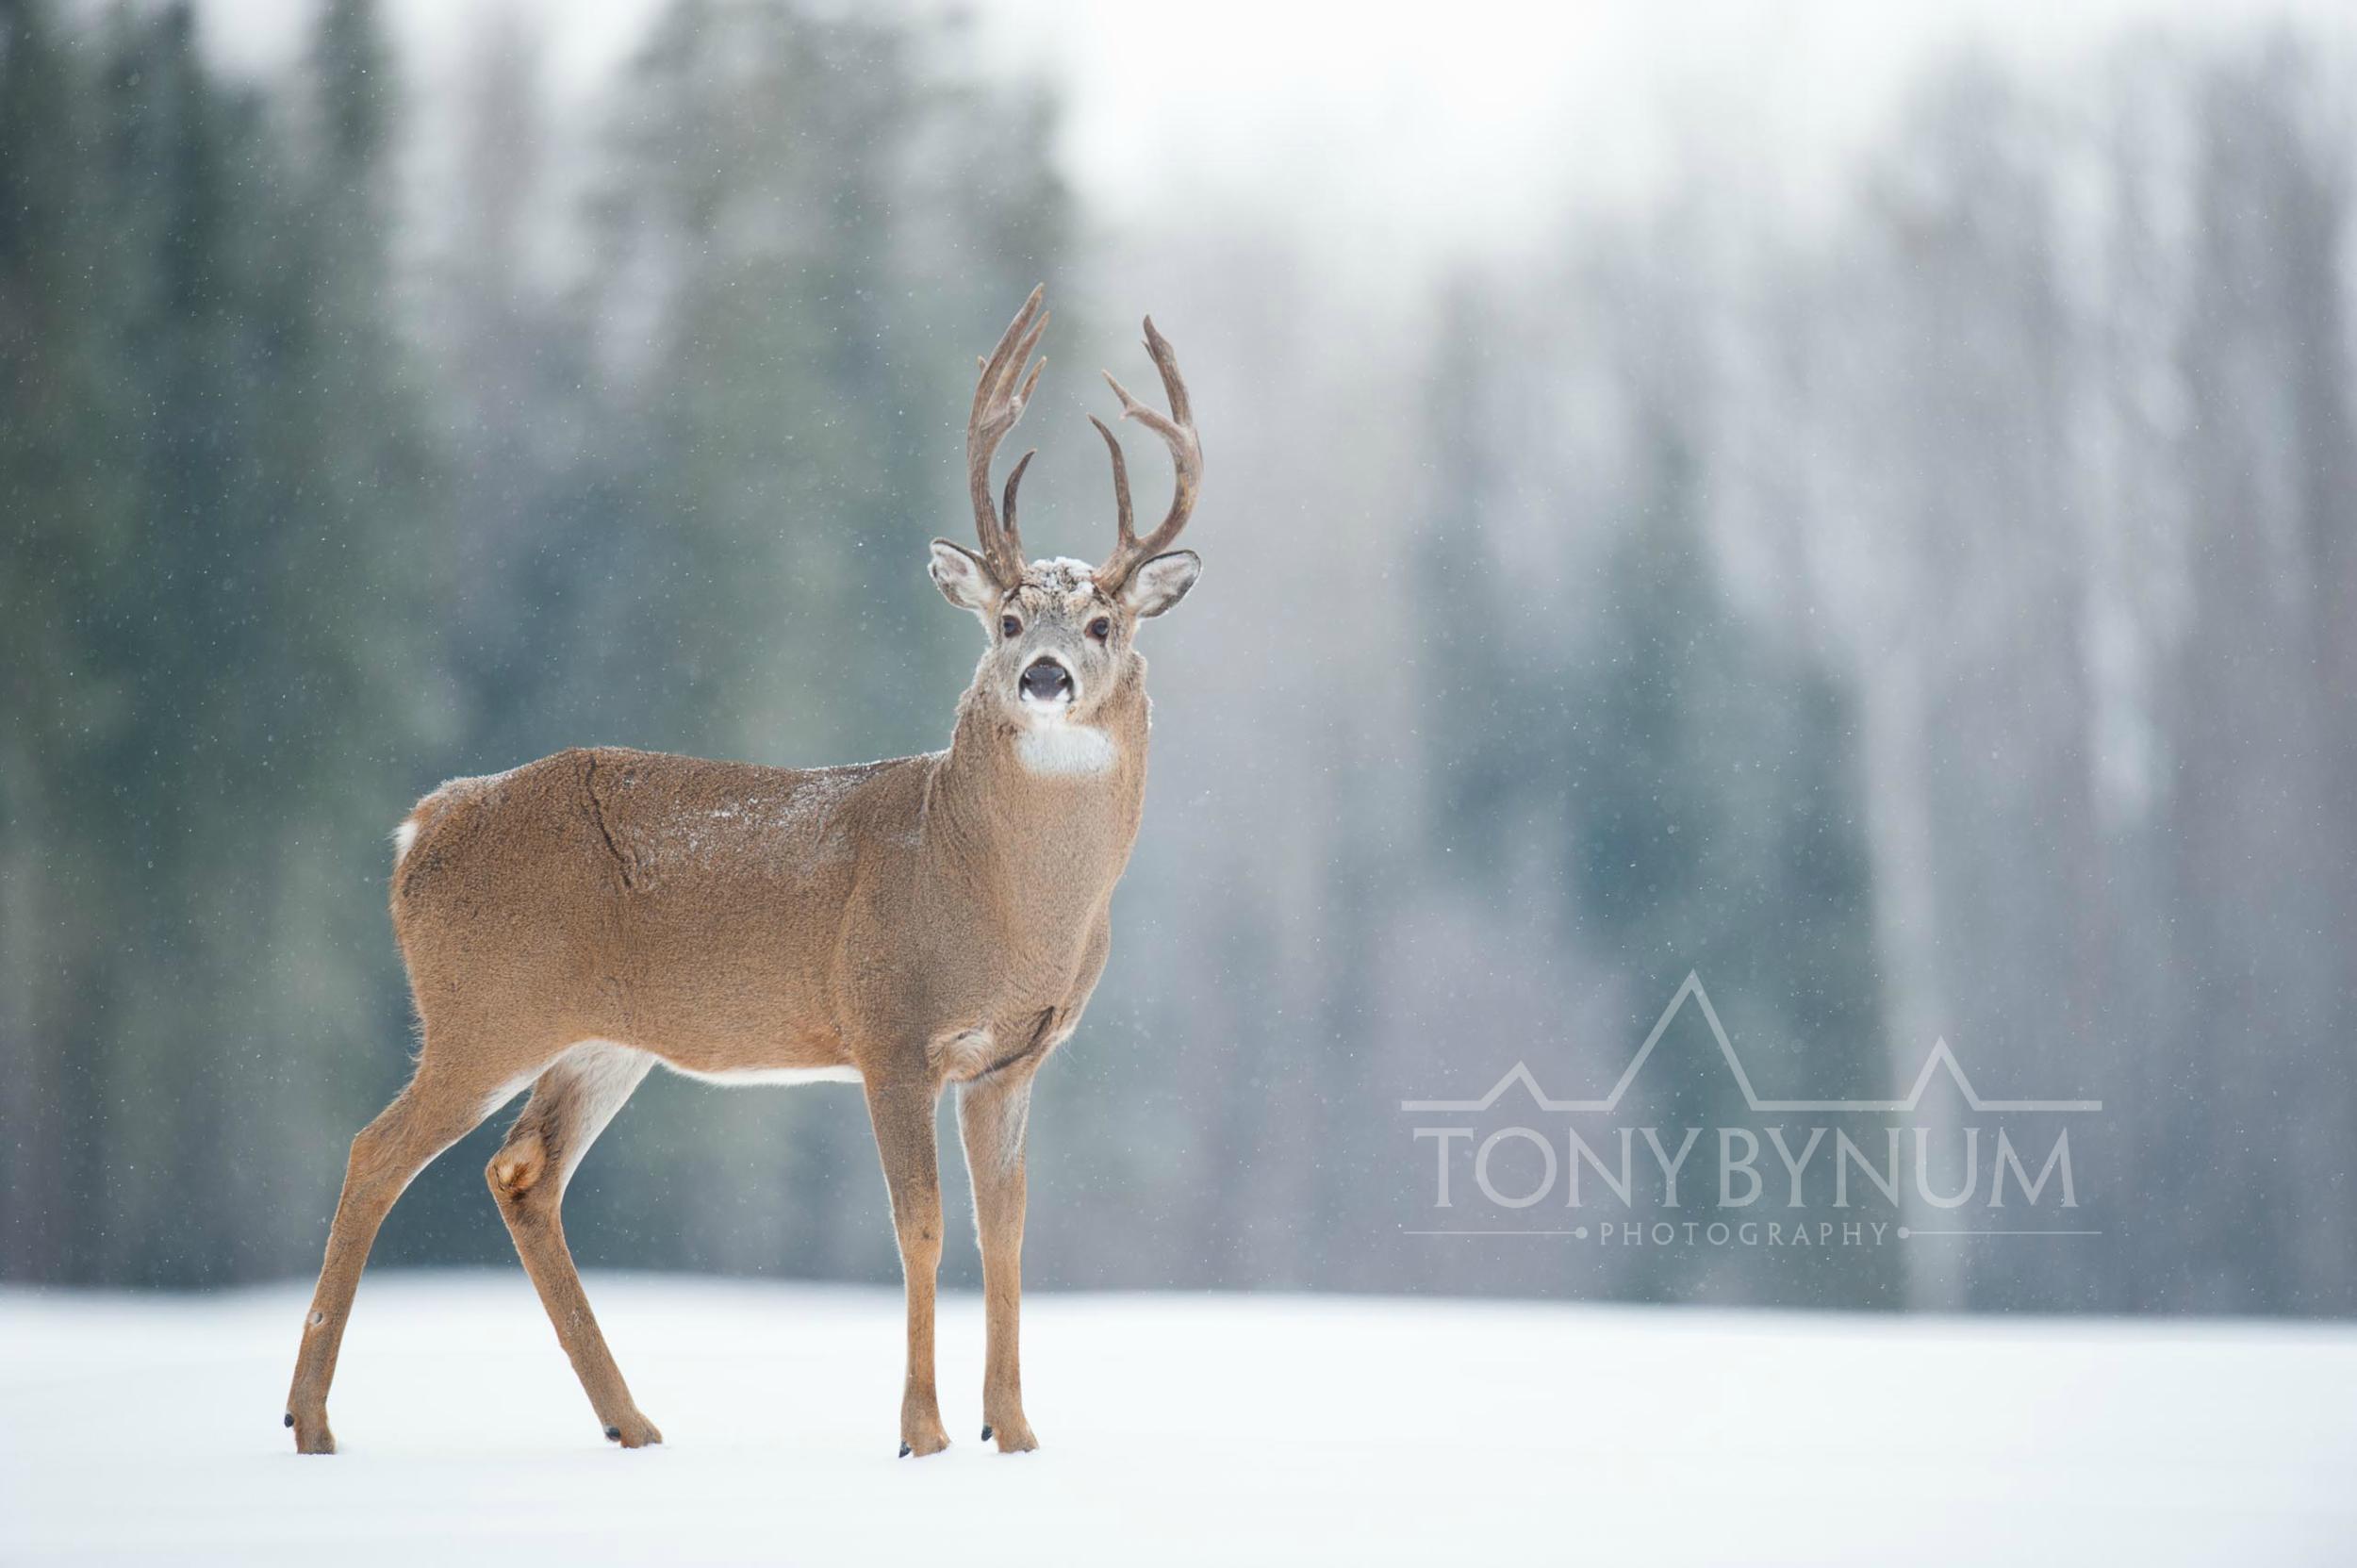 tony-bynum-whitetail-snow